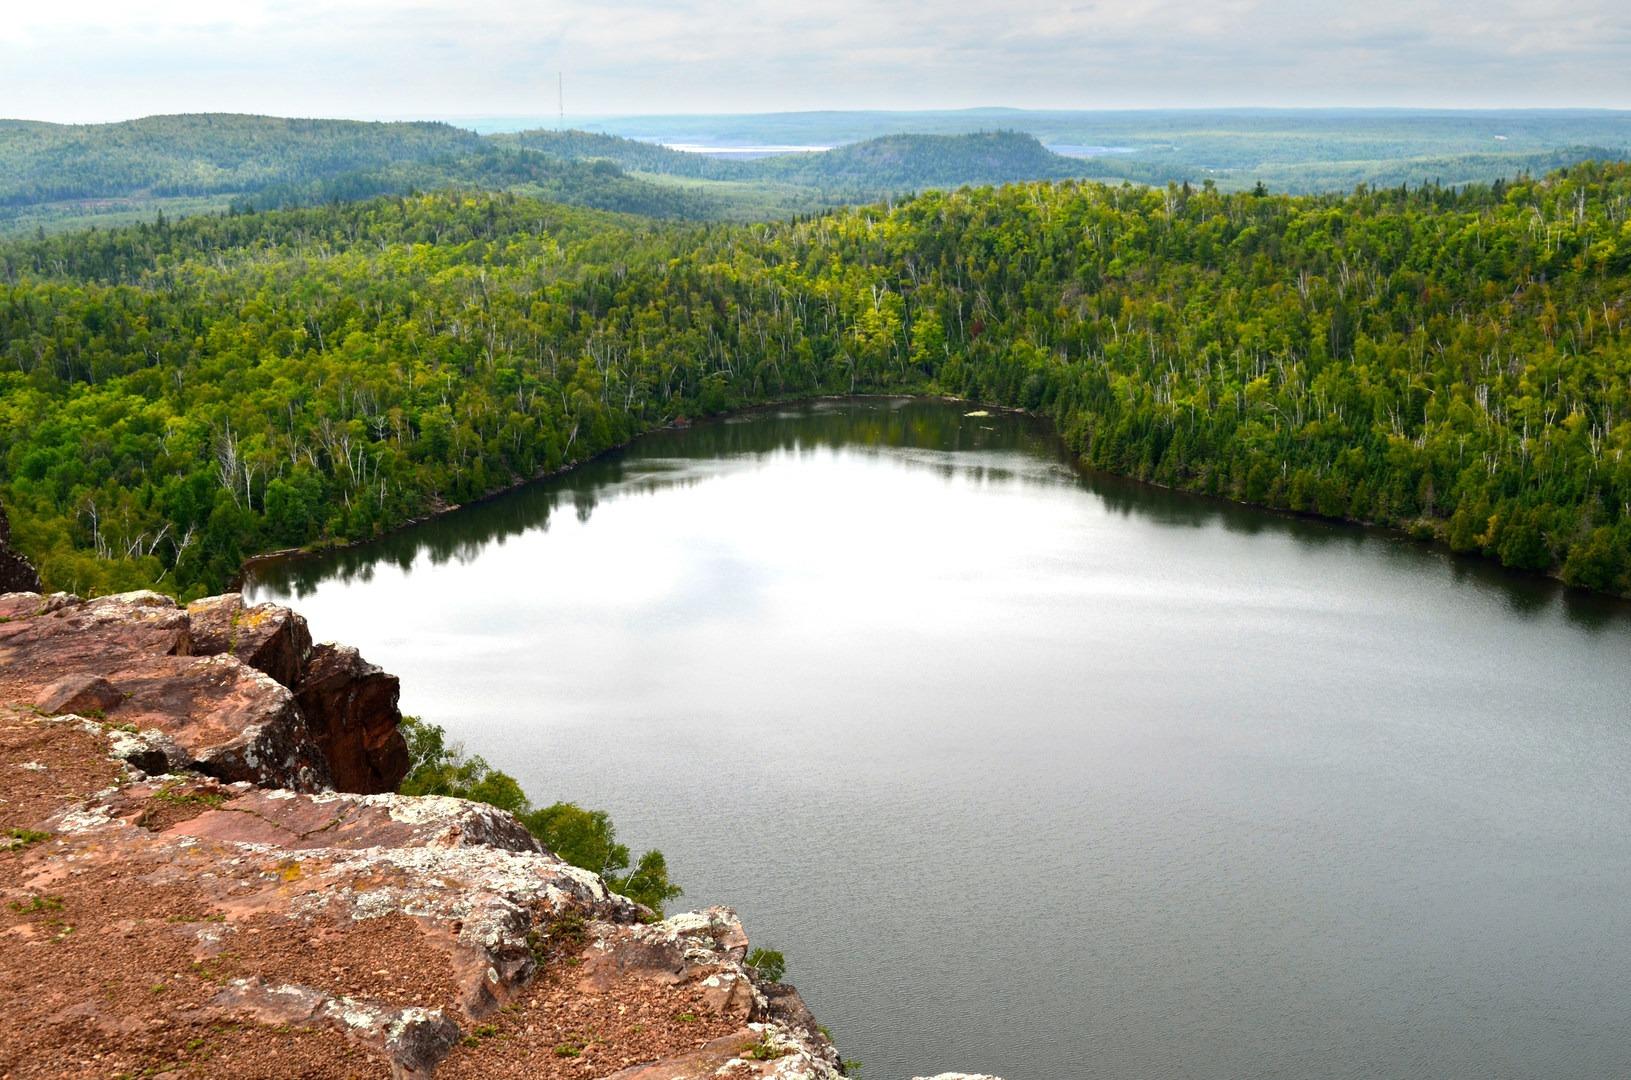 Bean Lake + Bear Lake via the Superior Hiking Trail